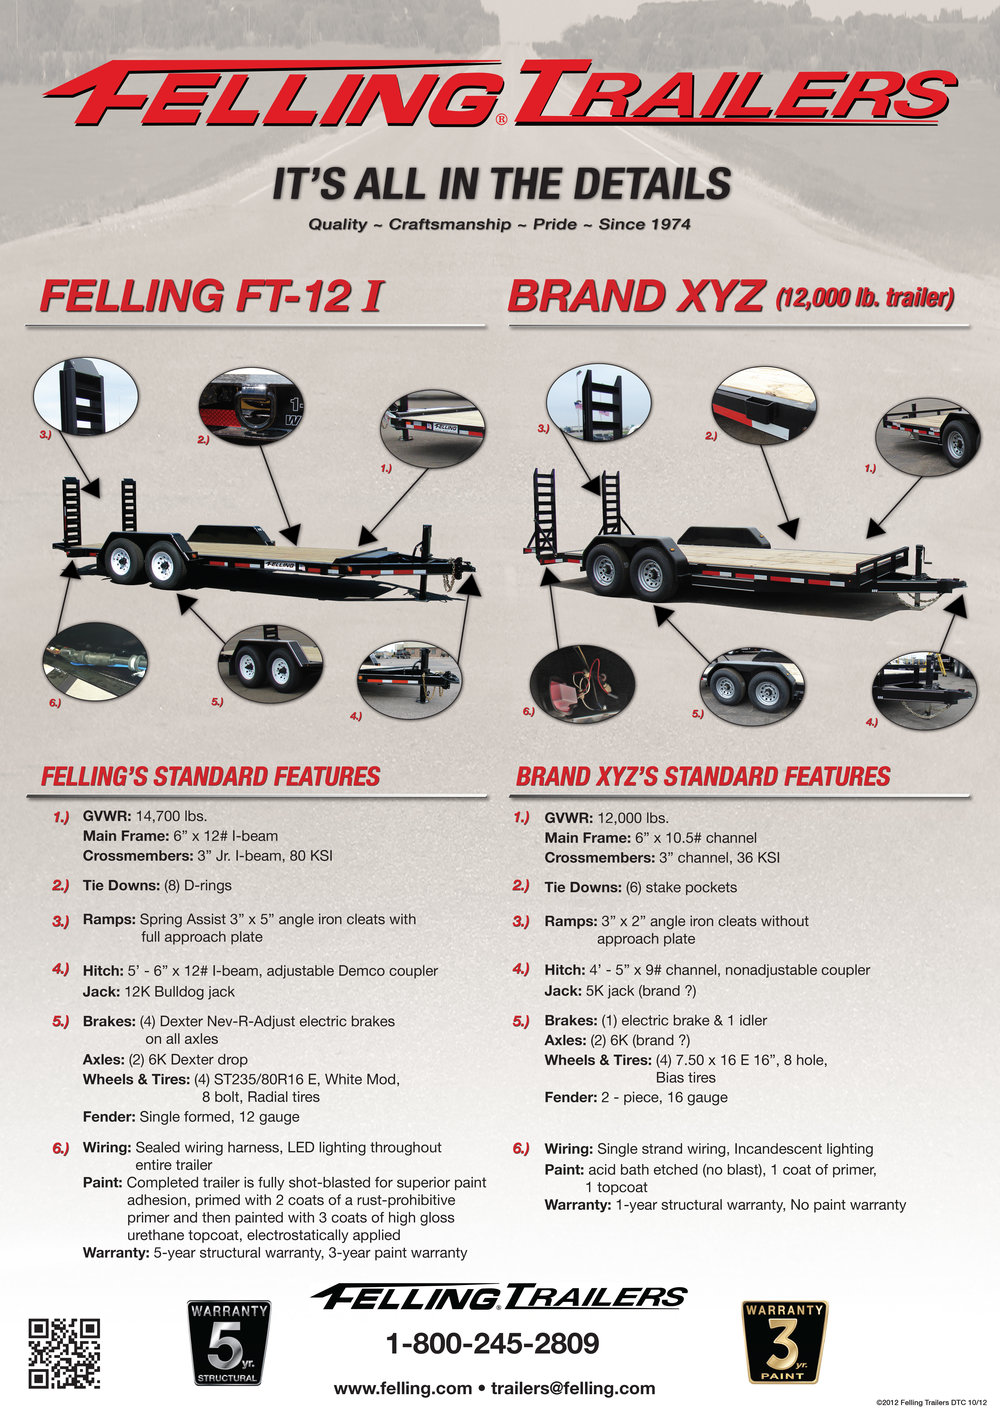 felling-trailers-details